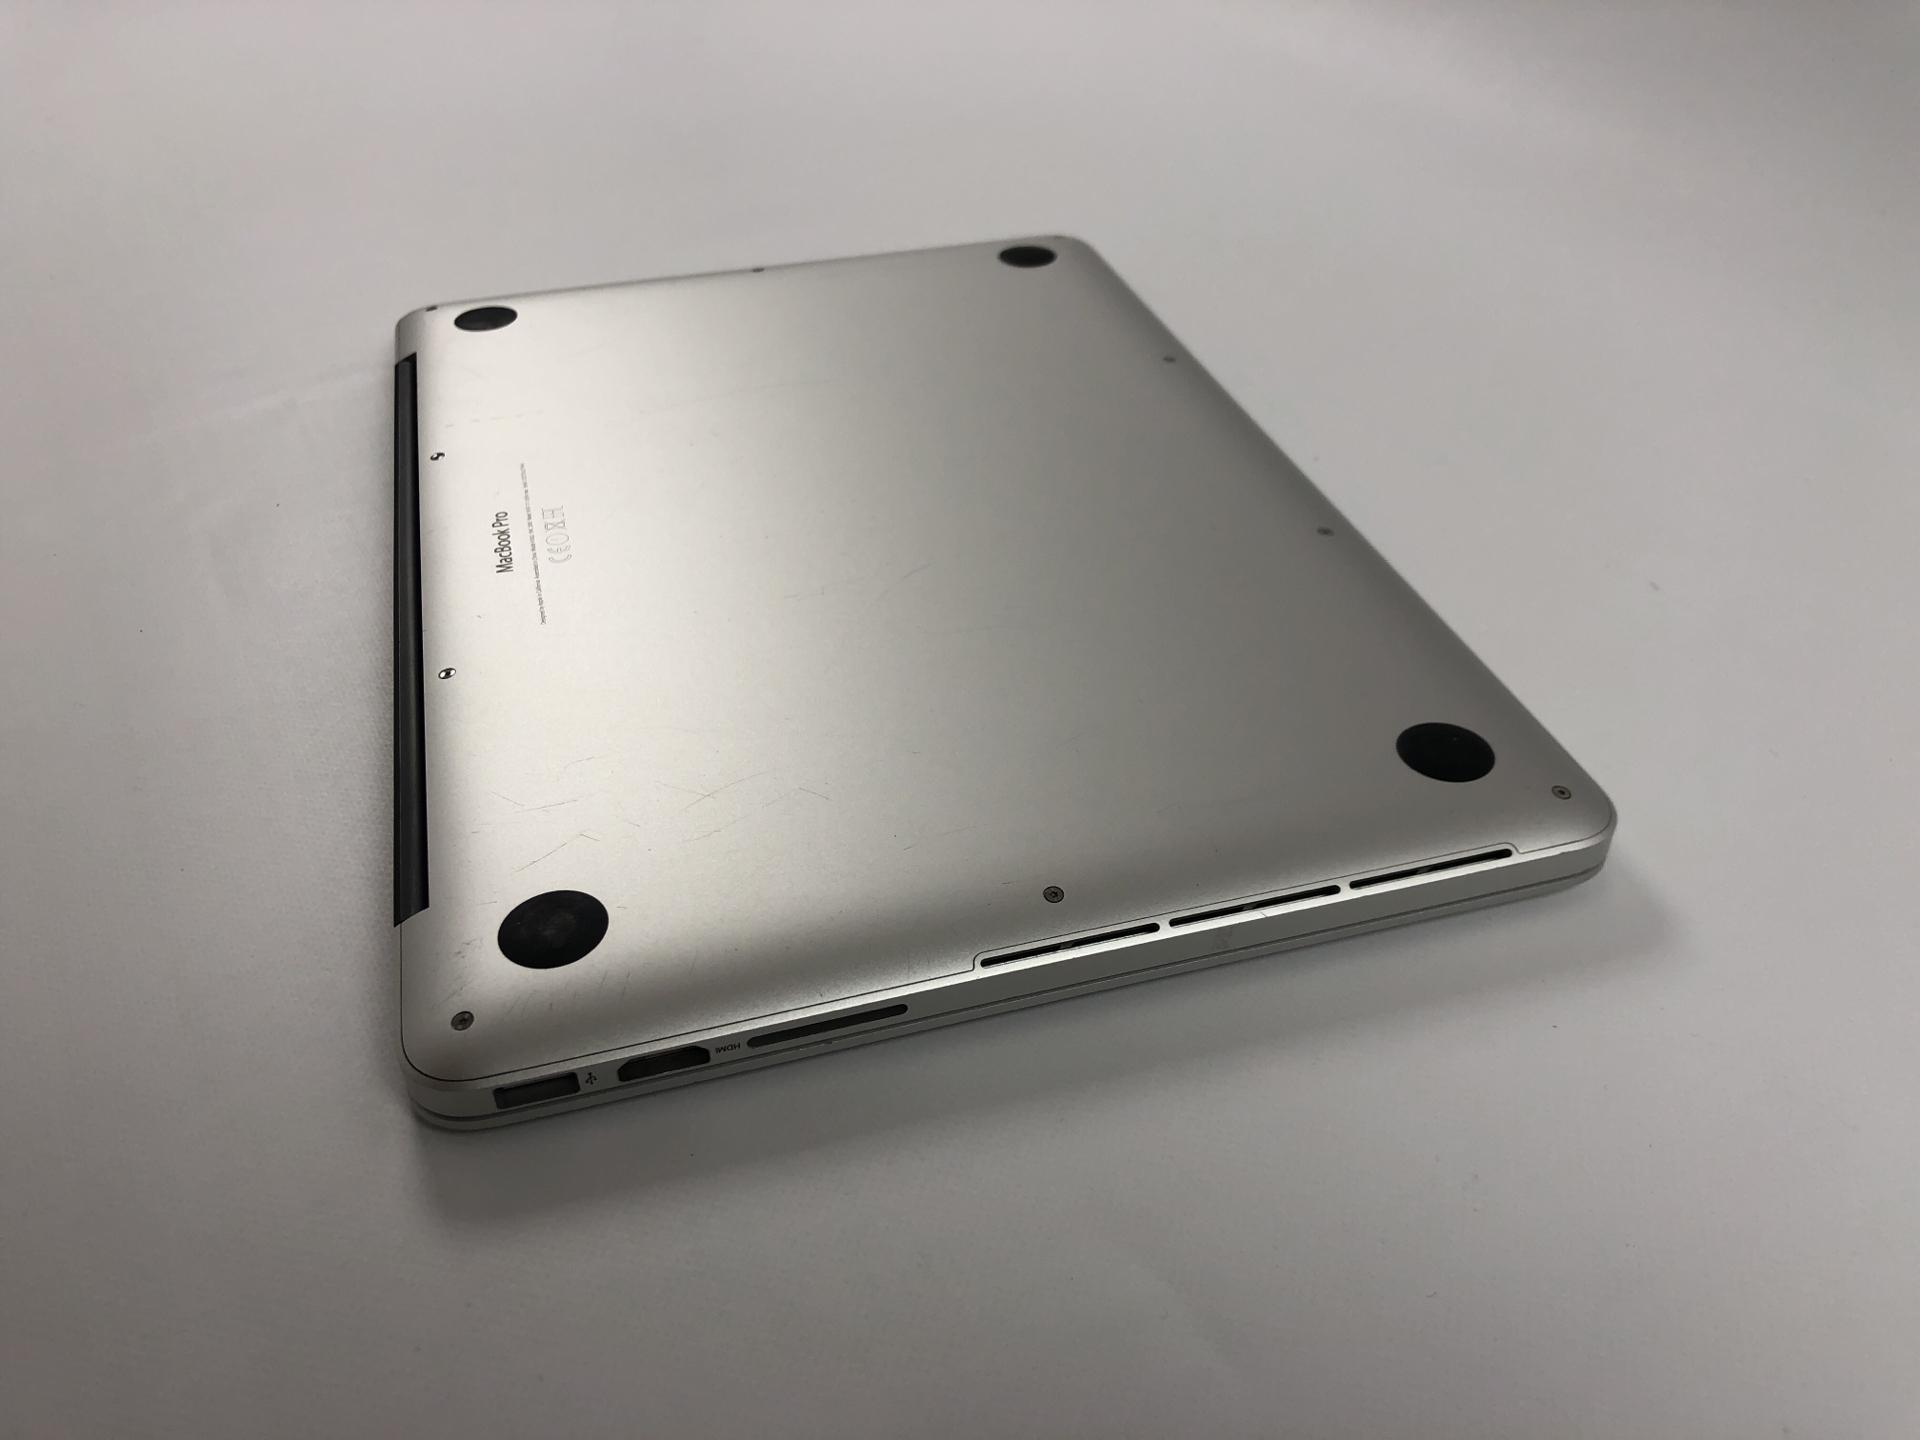 "MacBook Pro Retina 13"" Early 2015 (Intel Core i5 2.9 GHz 16 GB RAM 512 GB SSD), Intel Core i5 2.9 GHz, 16 GB RAM, 512 GB SSD, Kuva 5"